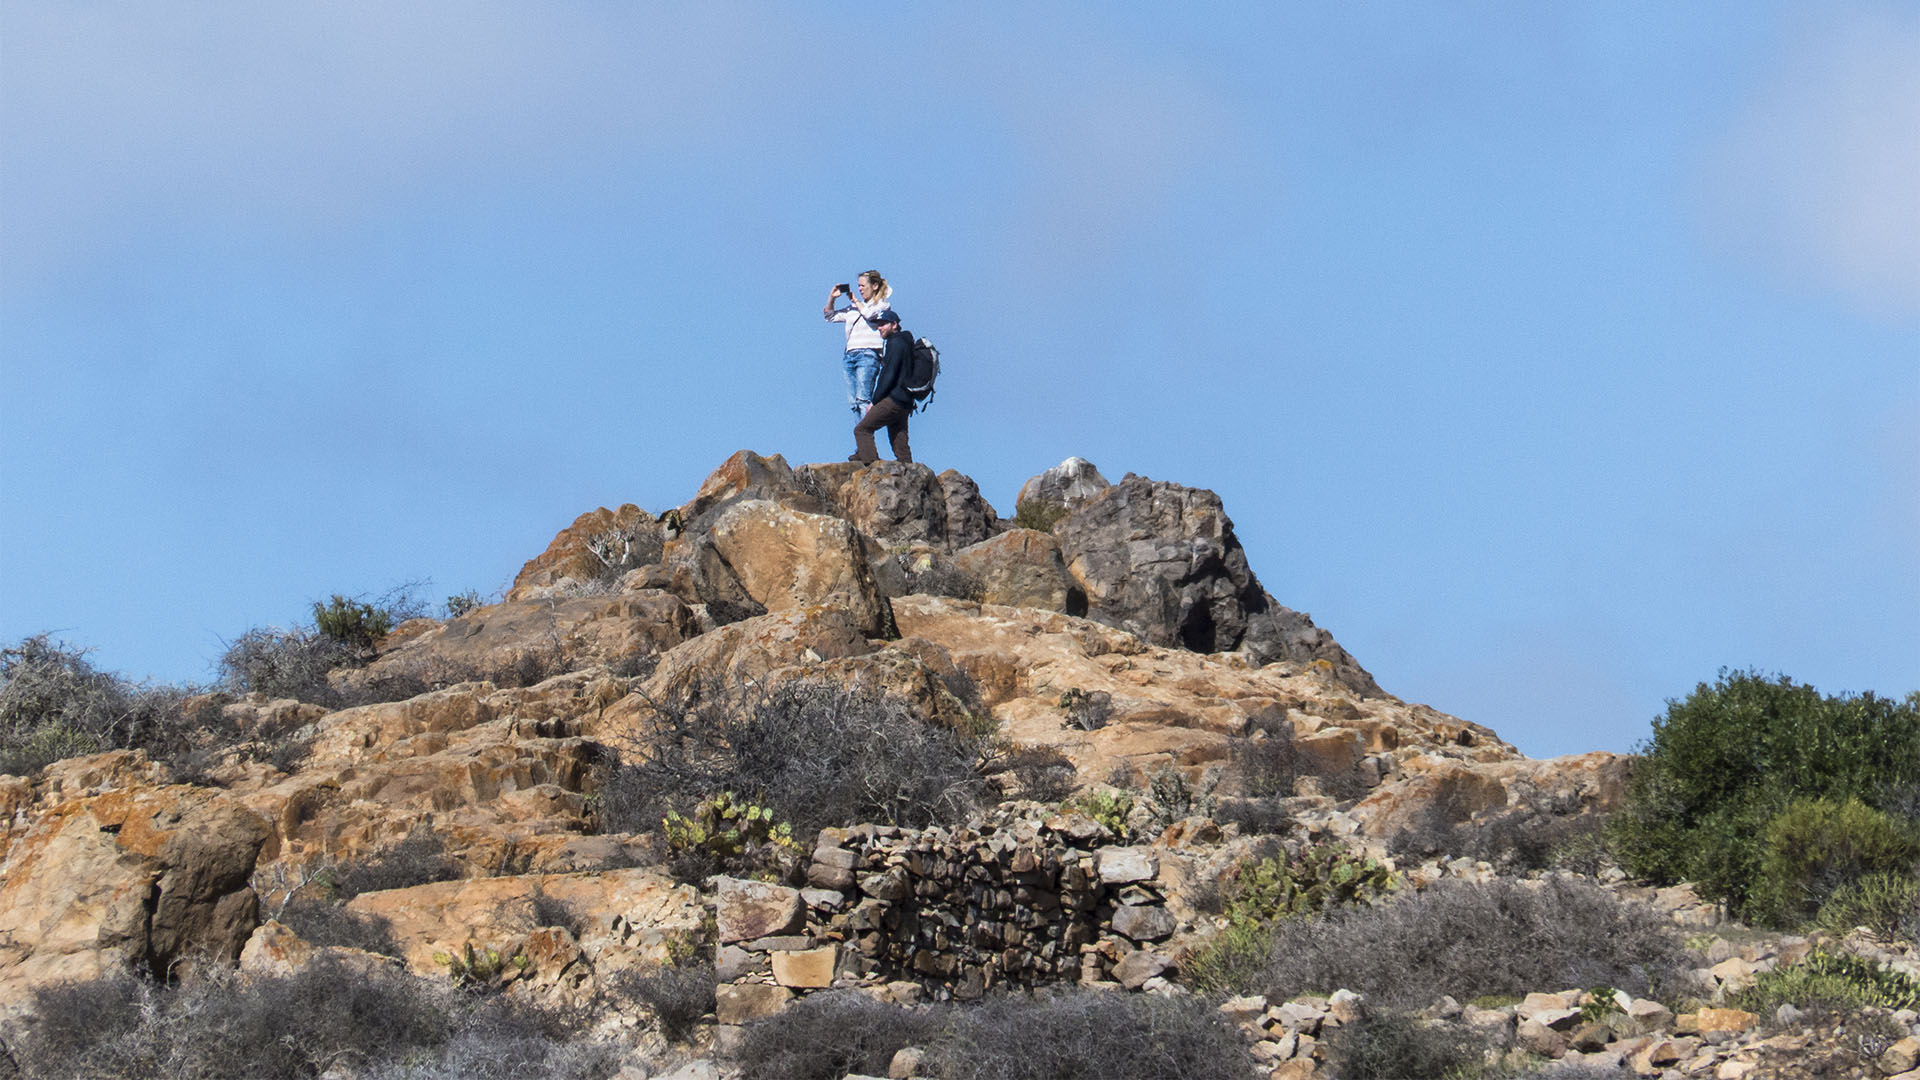 Morro del Humilladero Parque rural Parra Medina Betancuria Fuerteventura.